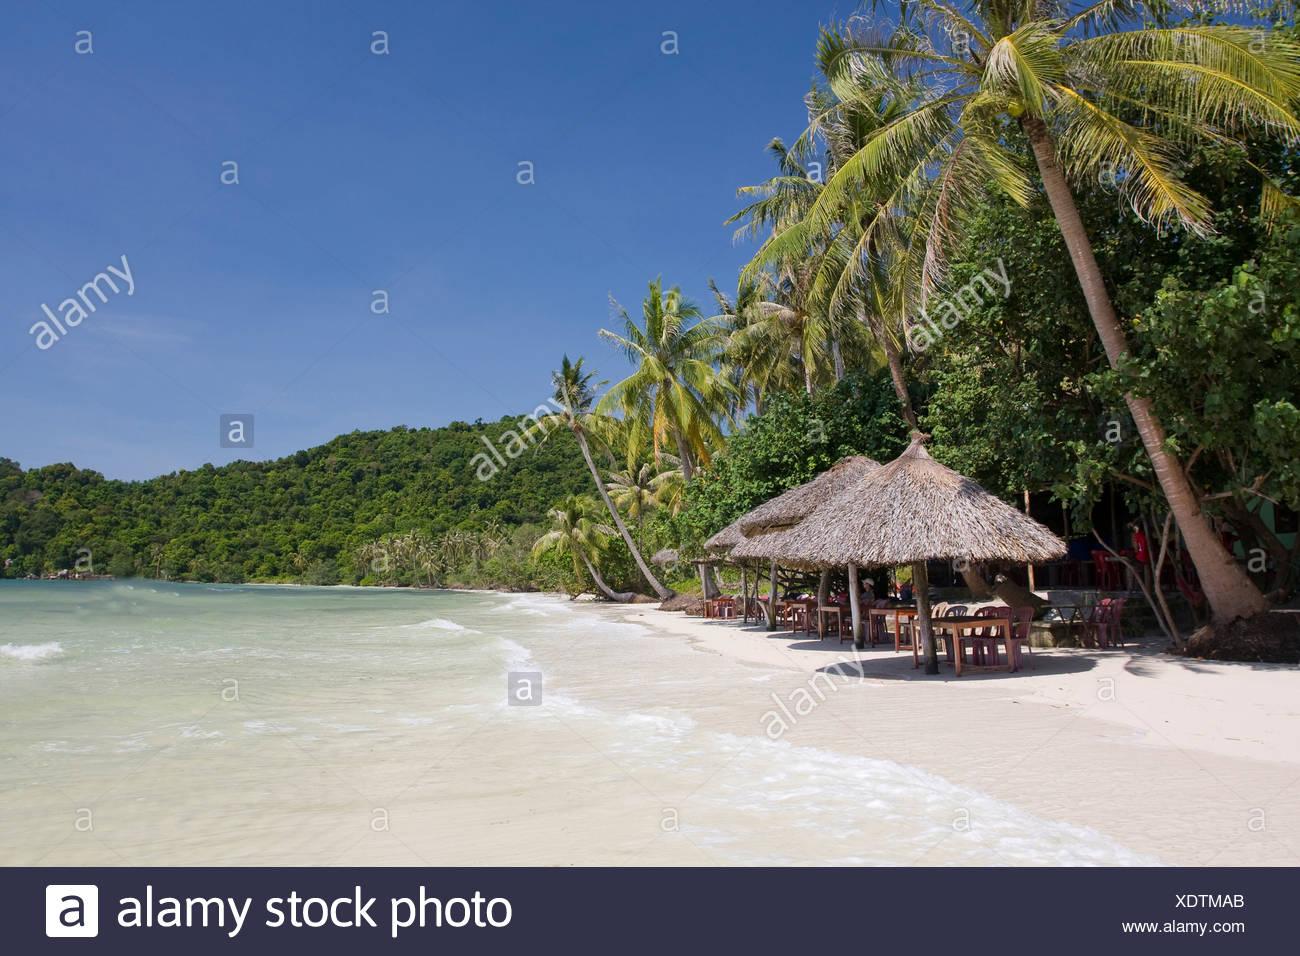 Asia, holidays, island, isle, sea, palms, Phu, Quoc, South-East Asia, South Pacific, sand beach, Sao, beach, seashore, beach vac - Stock Image